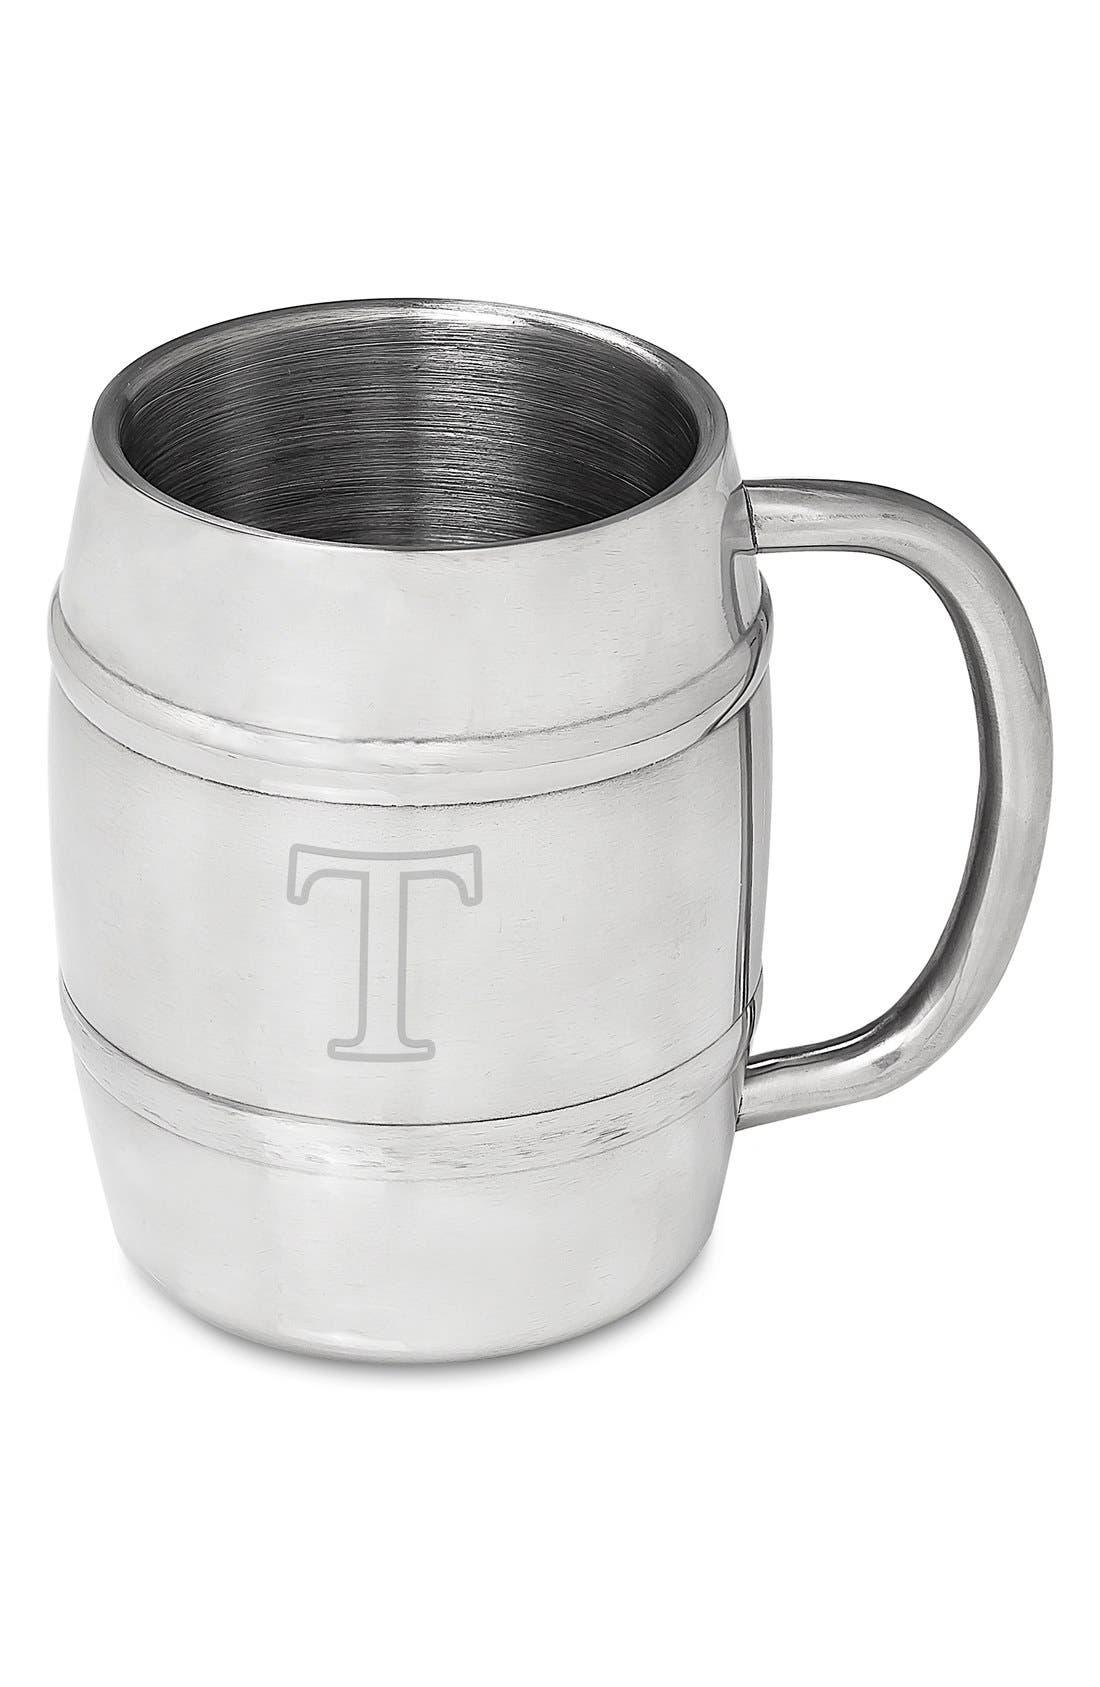 Monogram Stainless Steel Keg Mug,                             Main thumbnail 1, color,                             T